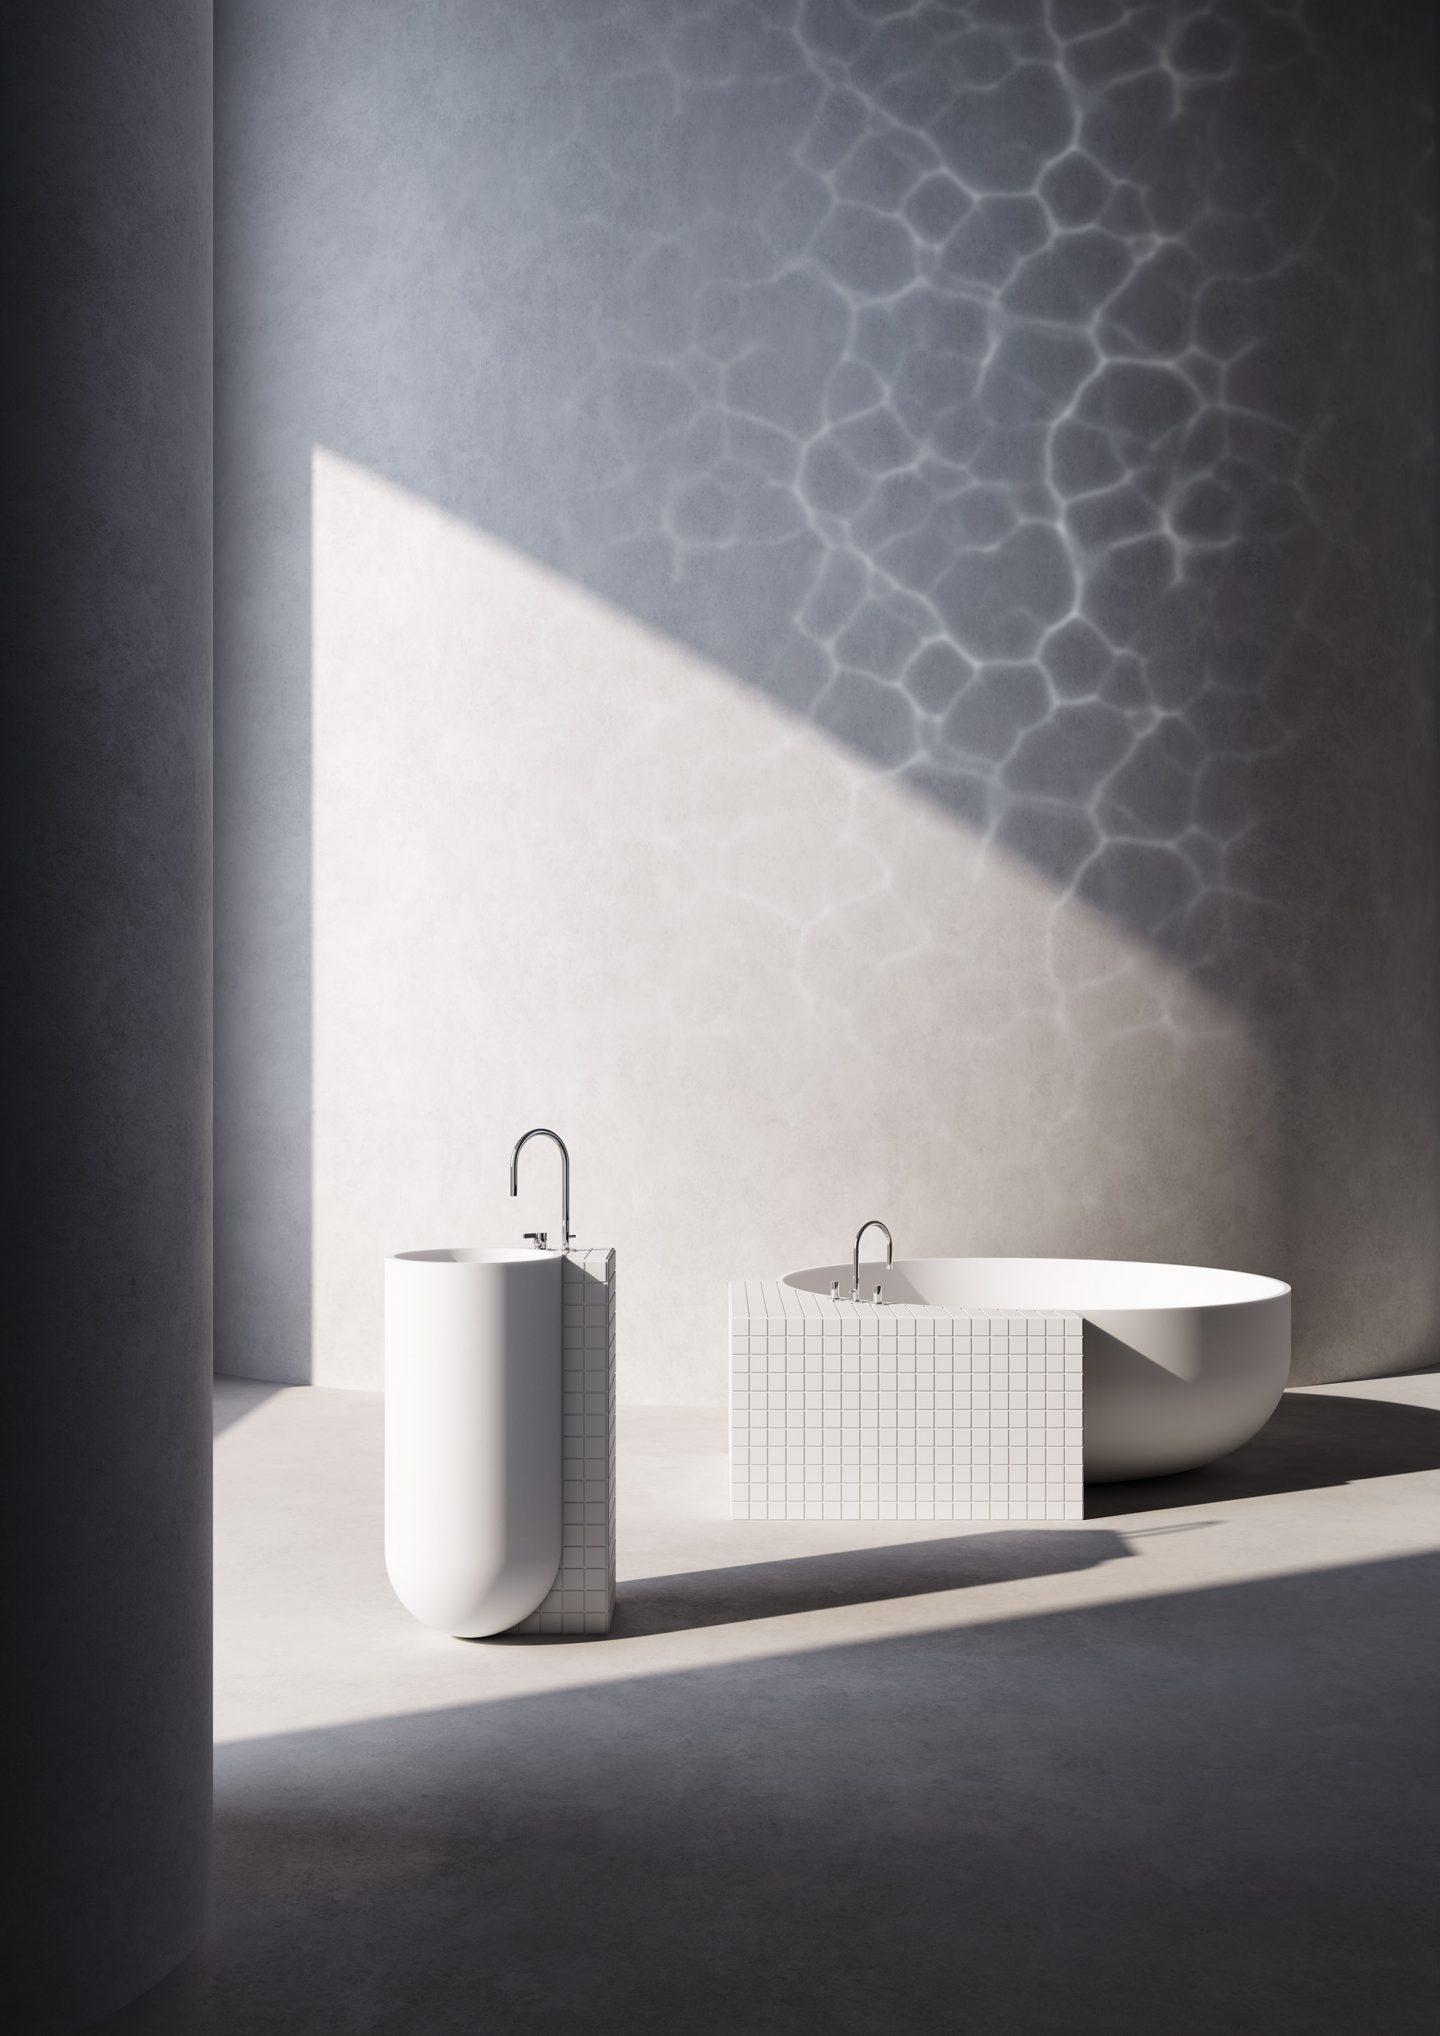 IGNANT-Design-MUTStudio-3D-Massimo-Colonna-BathroomCollection-AntonioLupi